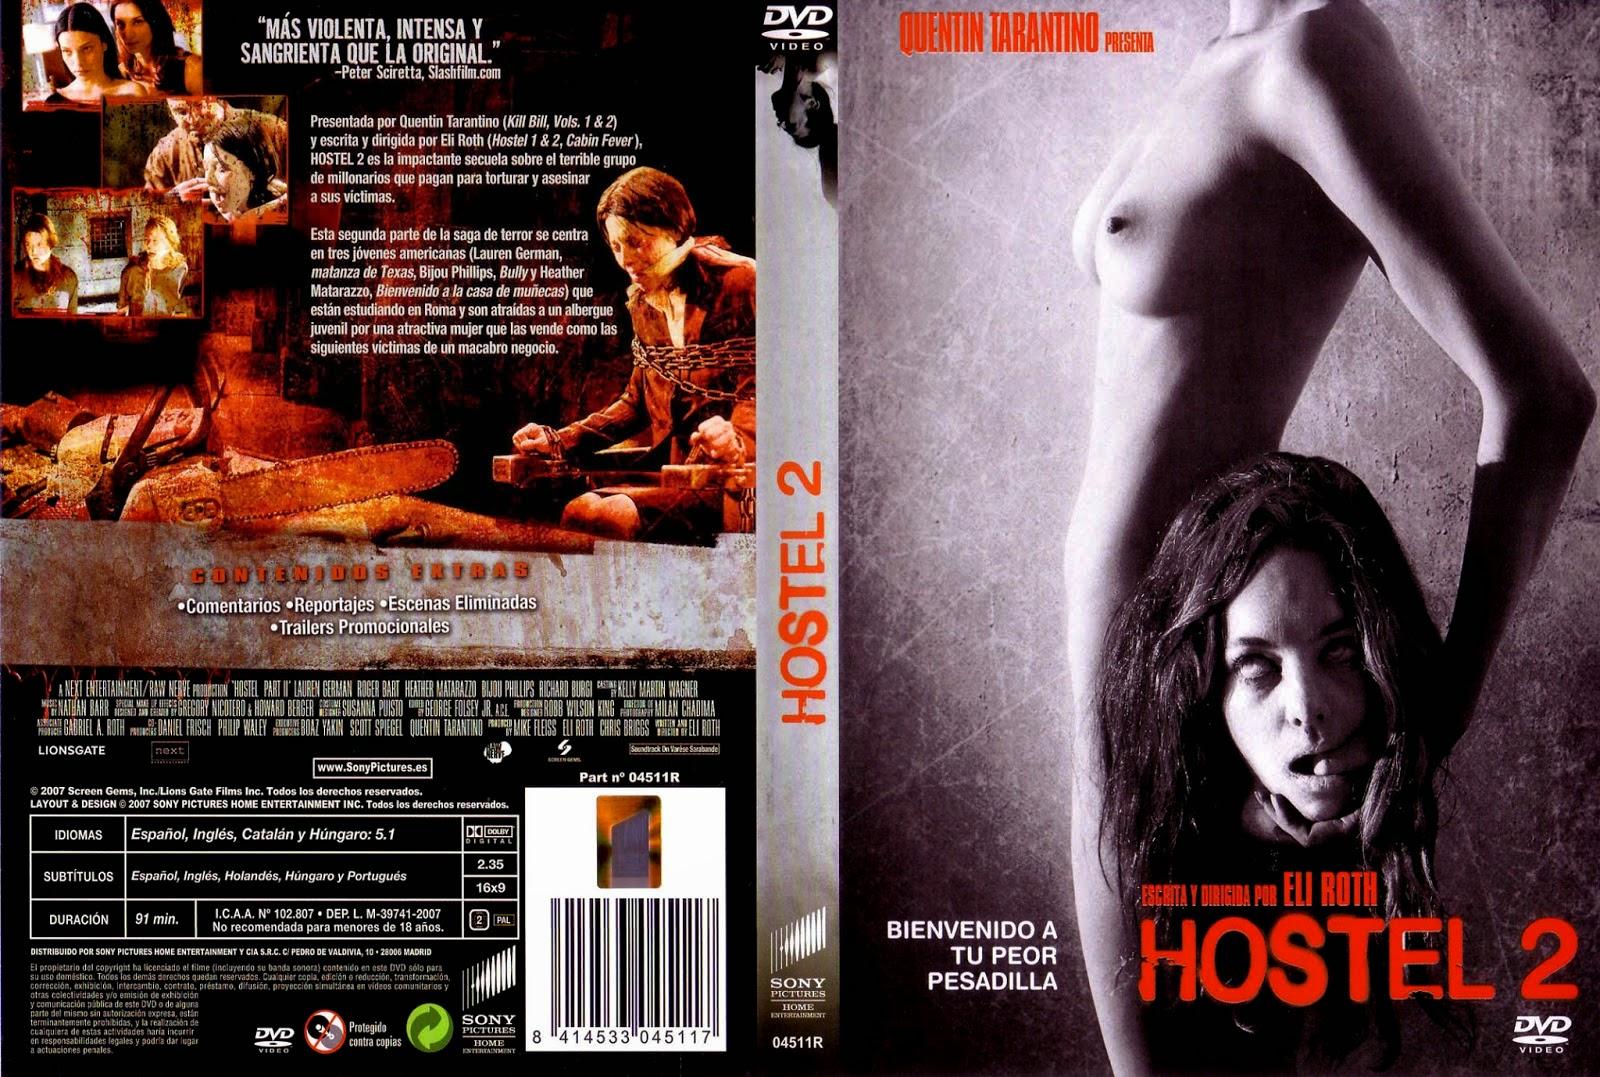 Hostel 2 DVD